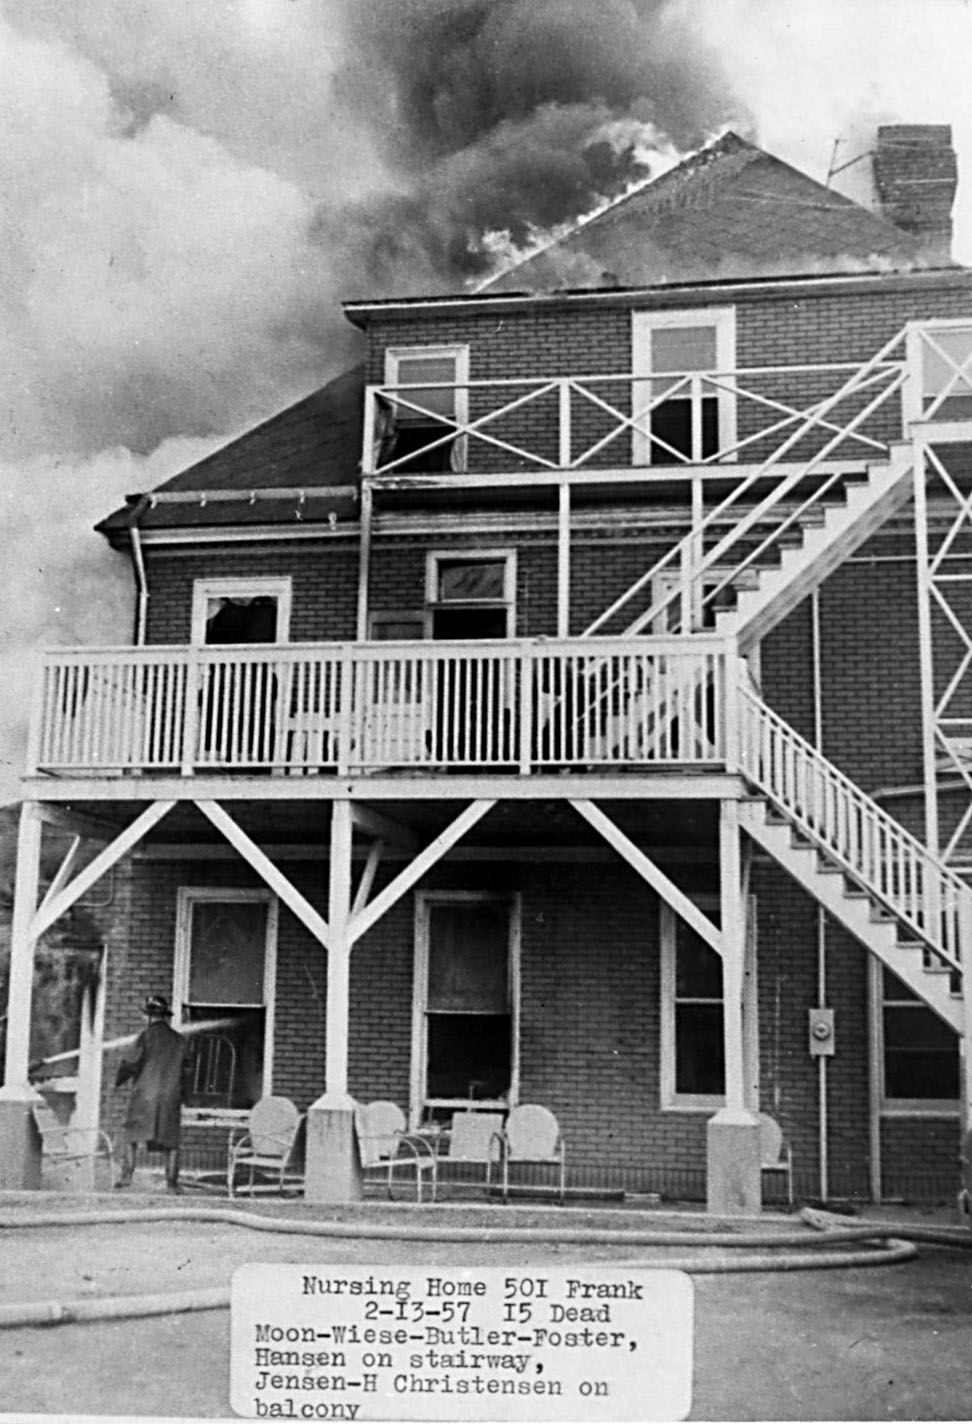 Convalescent Home fire of 1957